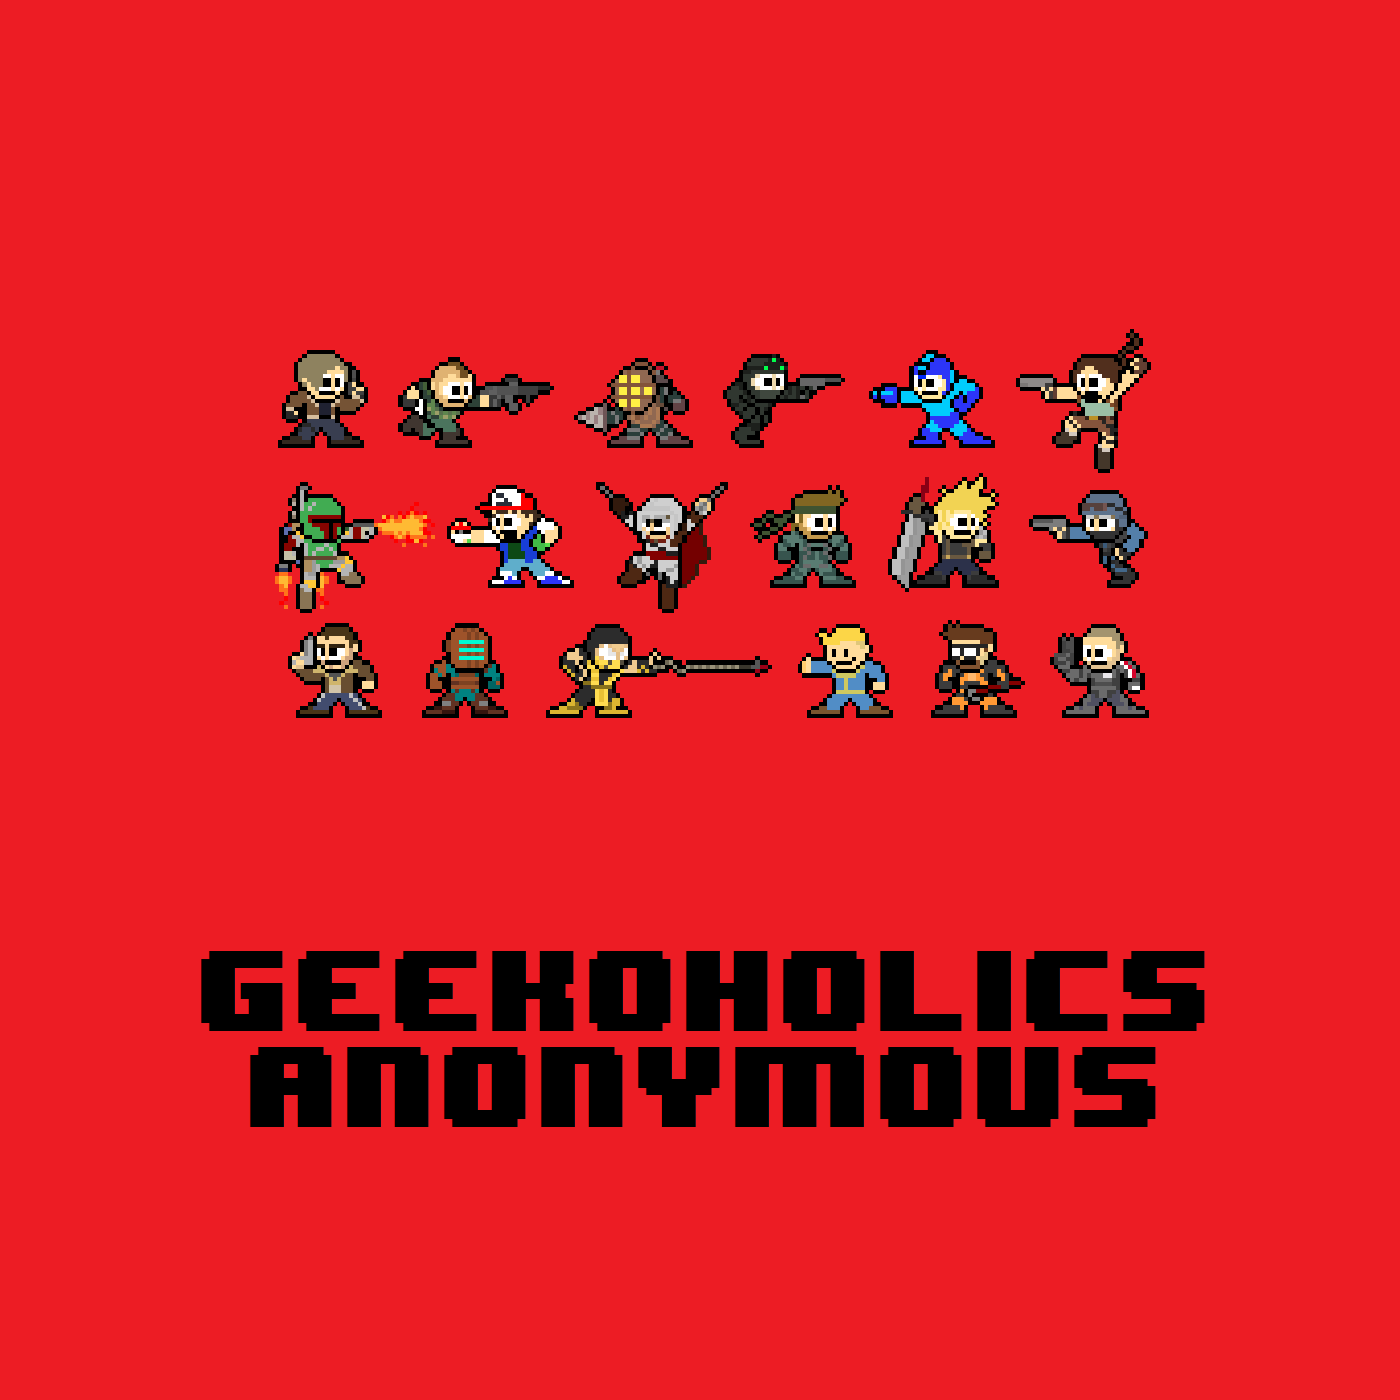 Immortals Fenyx Rising, Valhiem, Teenage Mutant Ninja Turtles and more - Geekoholics Anonymous Podcast 296 show art